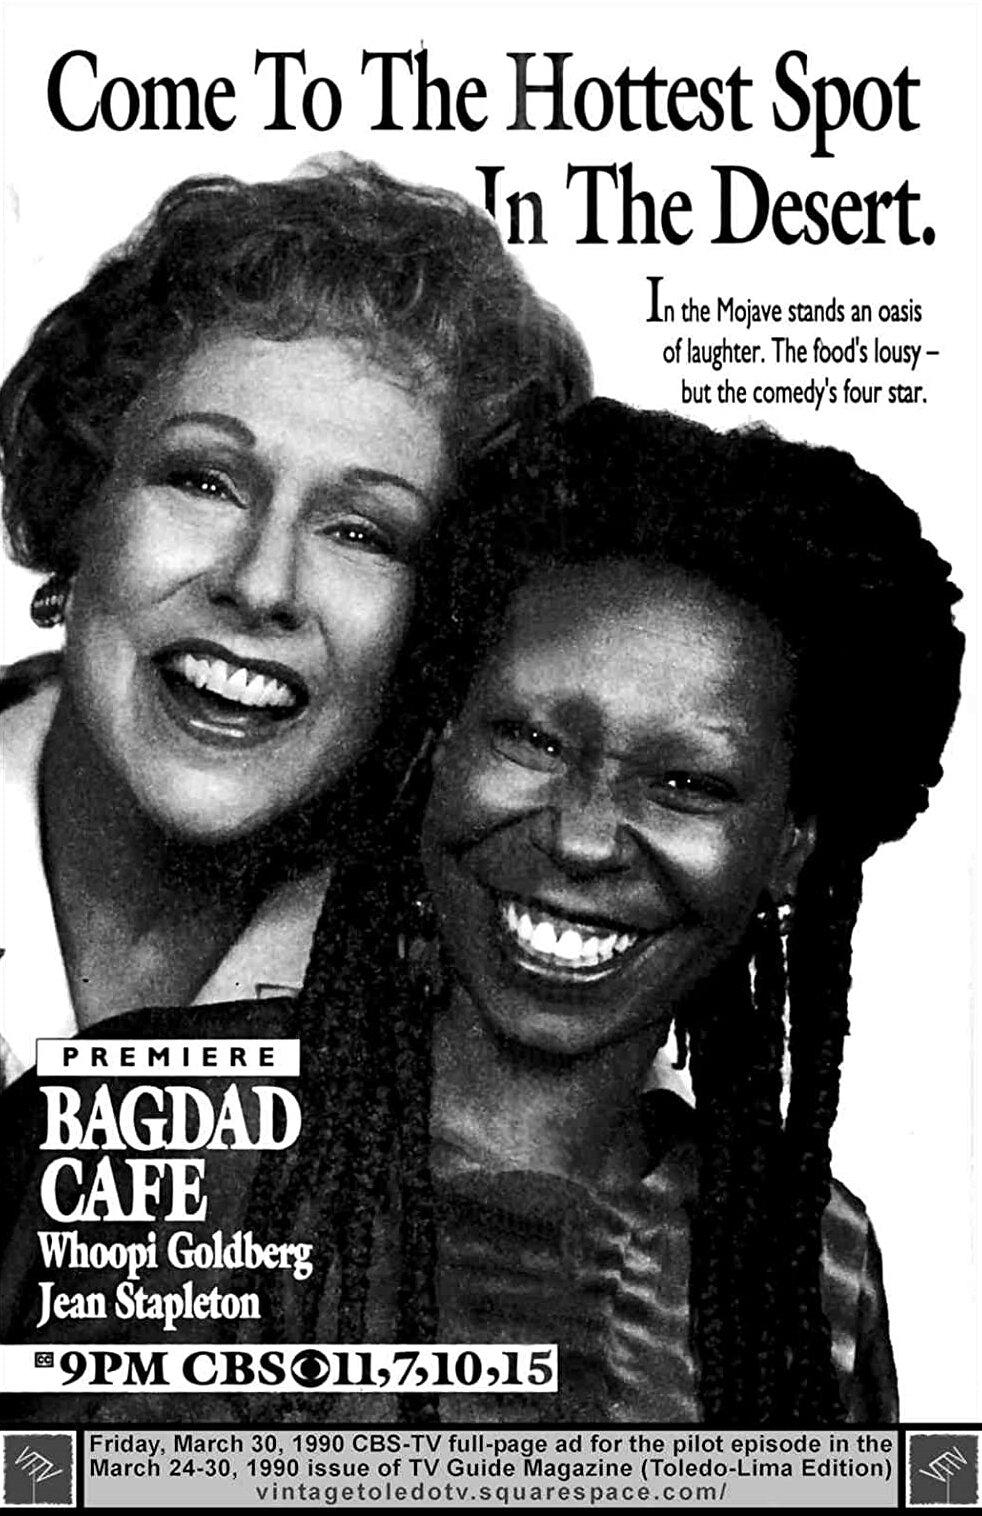 Bagdad Cafe ne zaman